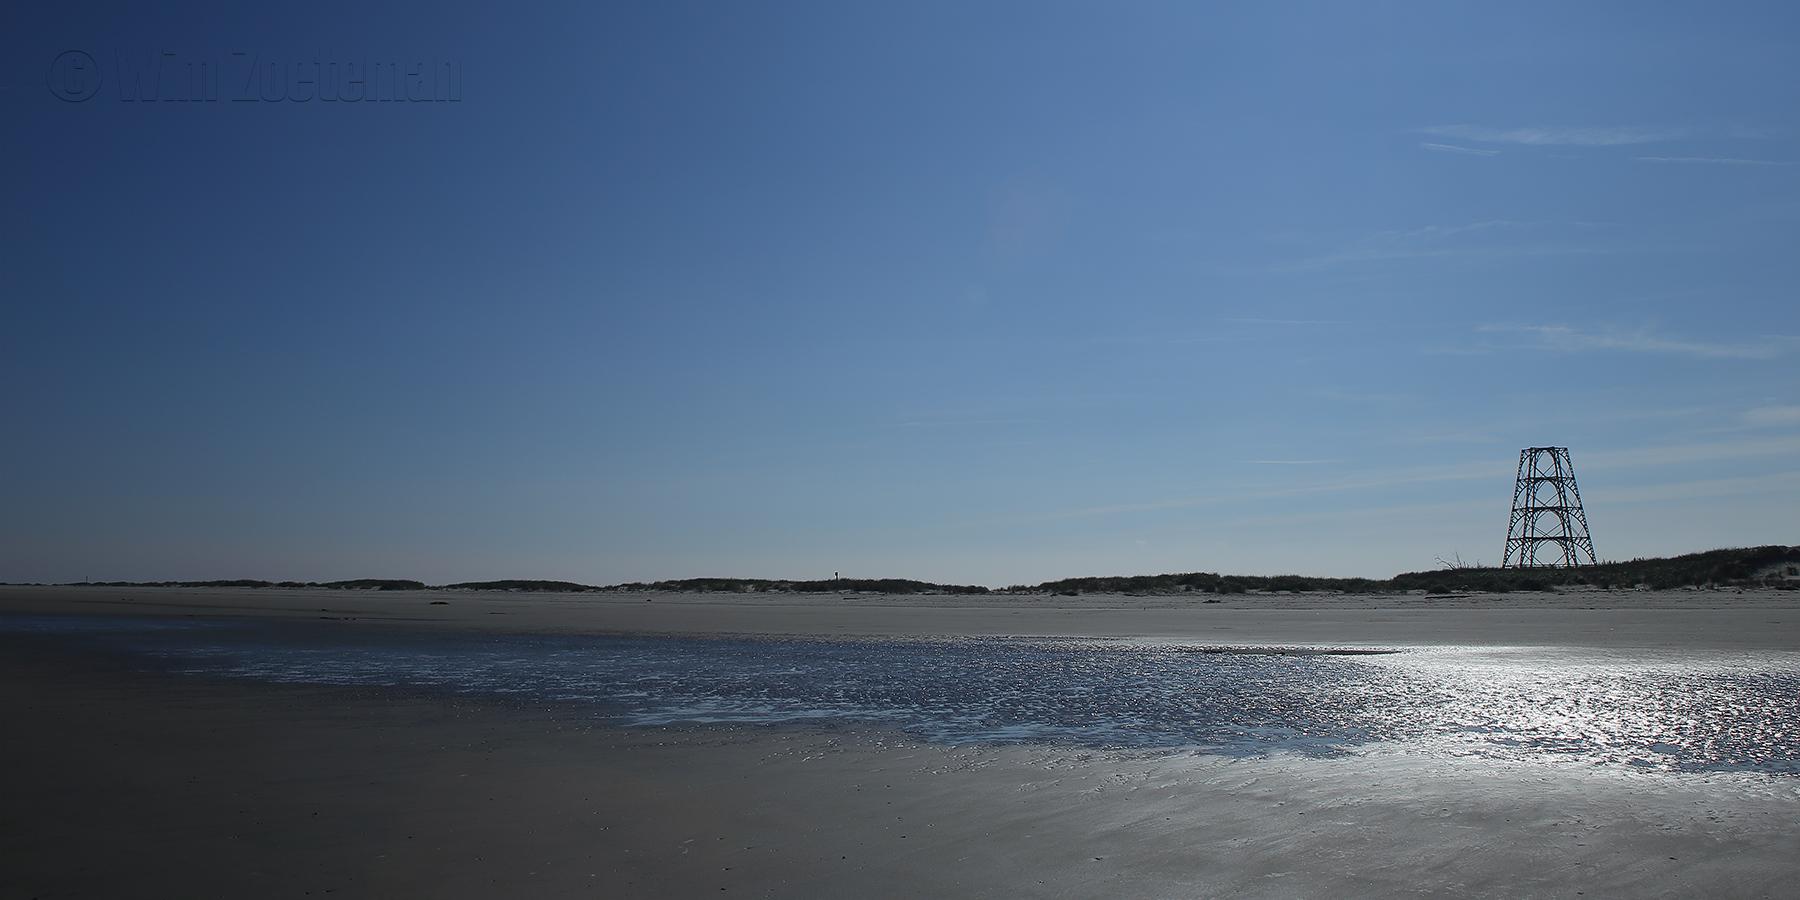 IMG_5648 Rottumeroog - Emder Kaap